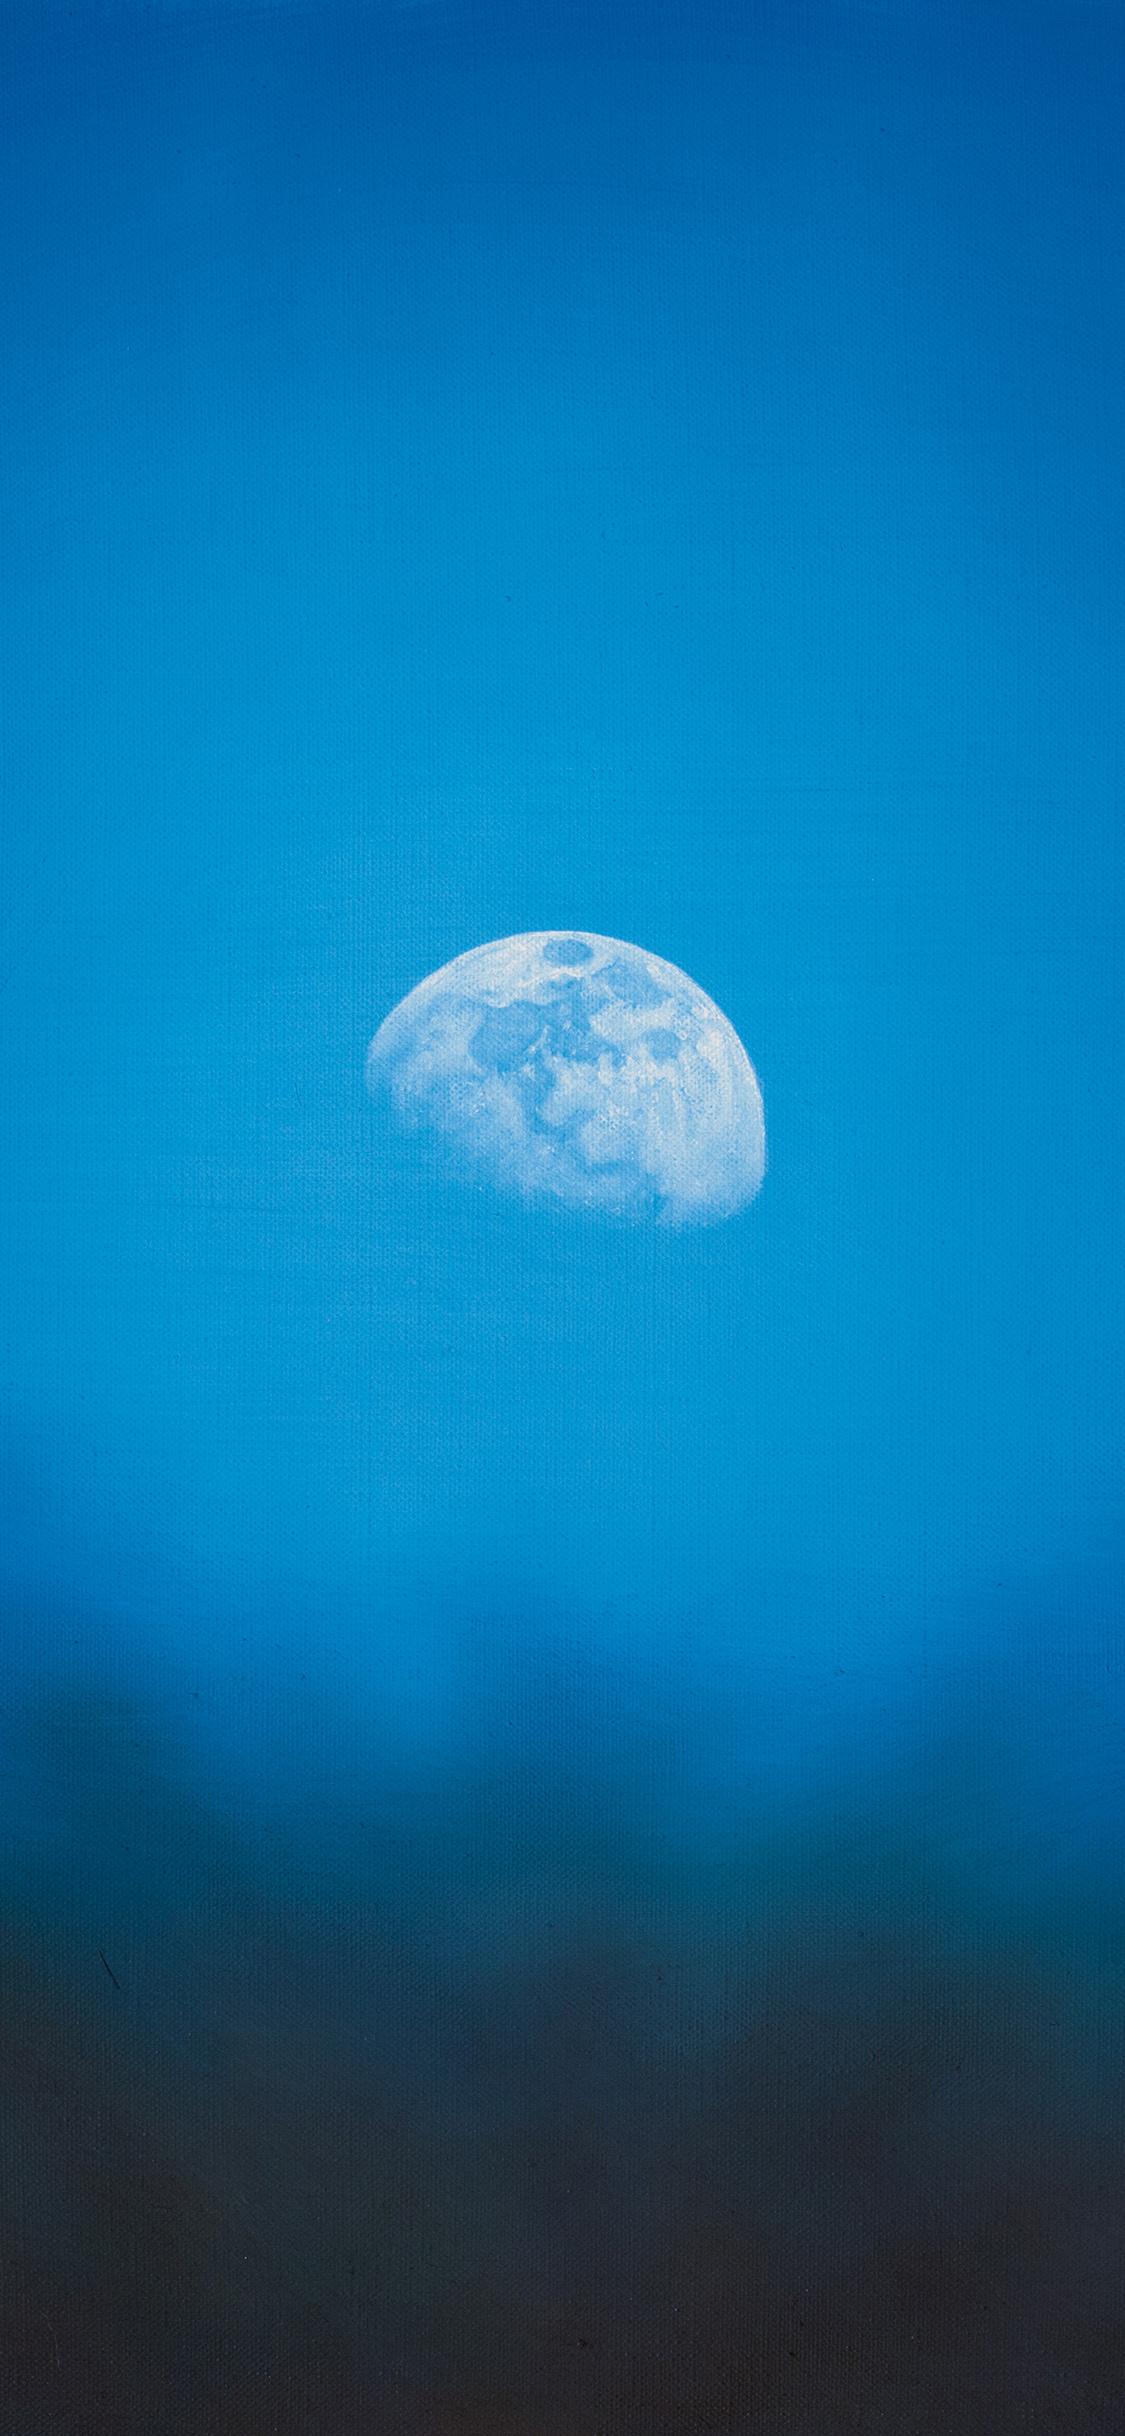 iPhoneXpapers.com-Apple-iPhone-wallpaper-mt01-moon-rise-day-nature-blue-dark-night